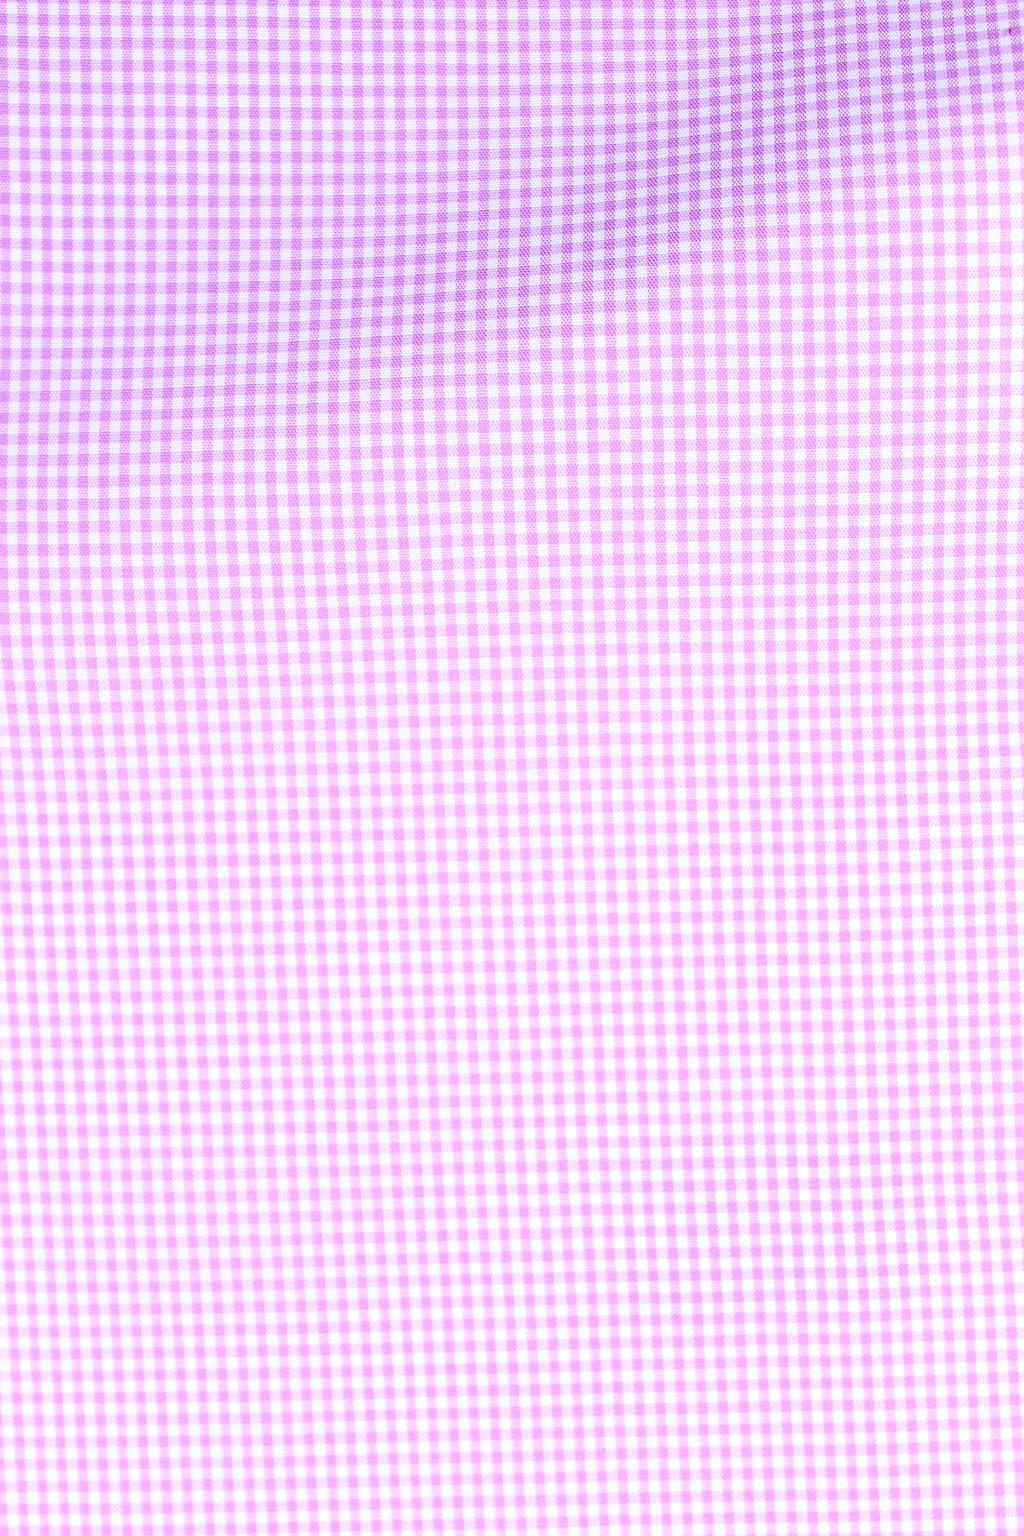 6621 Pink Micro Gingham.JPG